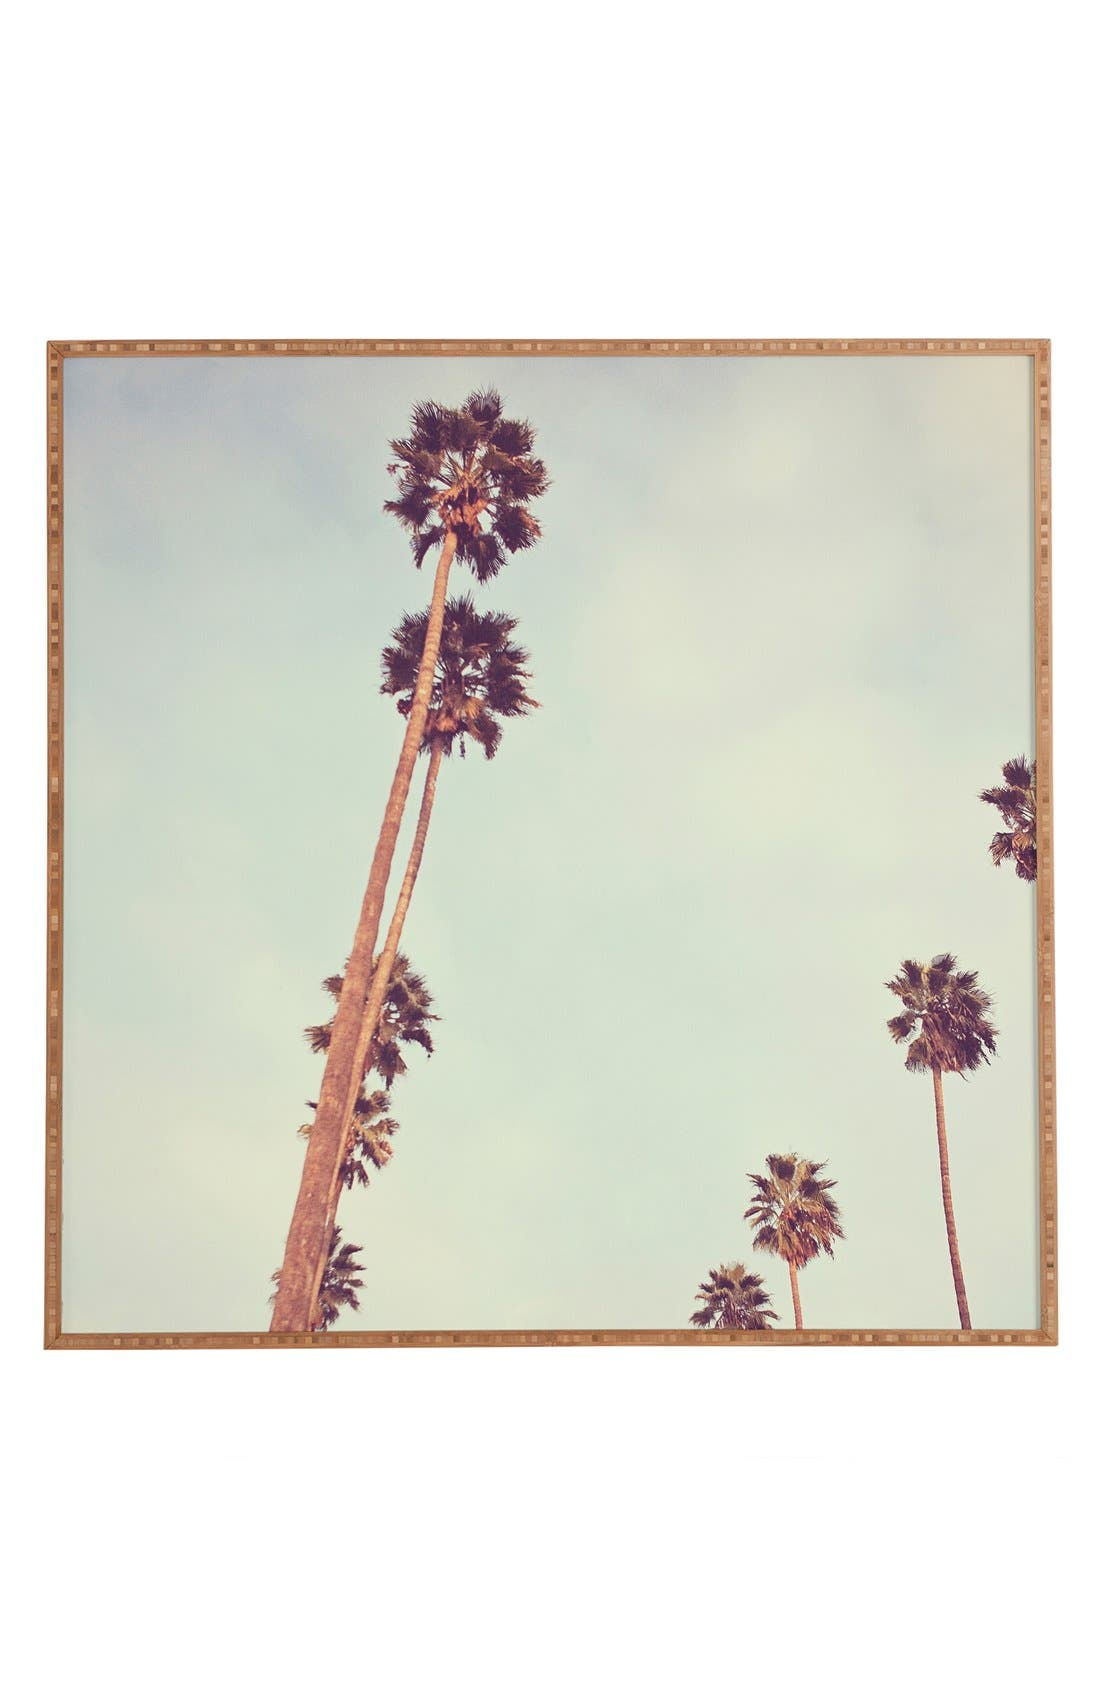 'Catherine McDonald - Streets of Los Angeles' Framed Wall Art,                             Main thumbnail 1, color,                             400